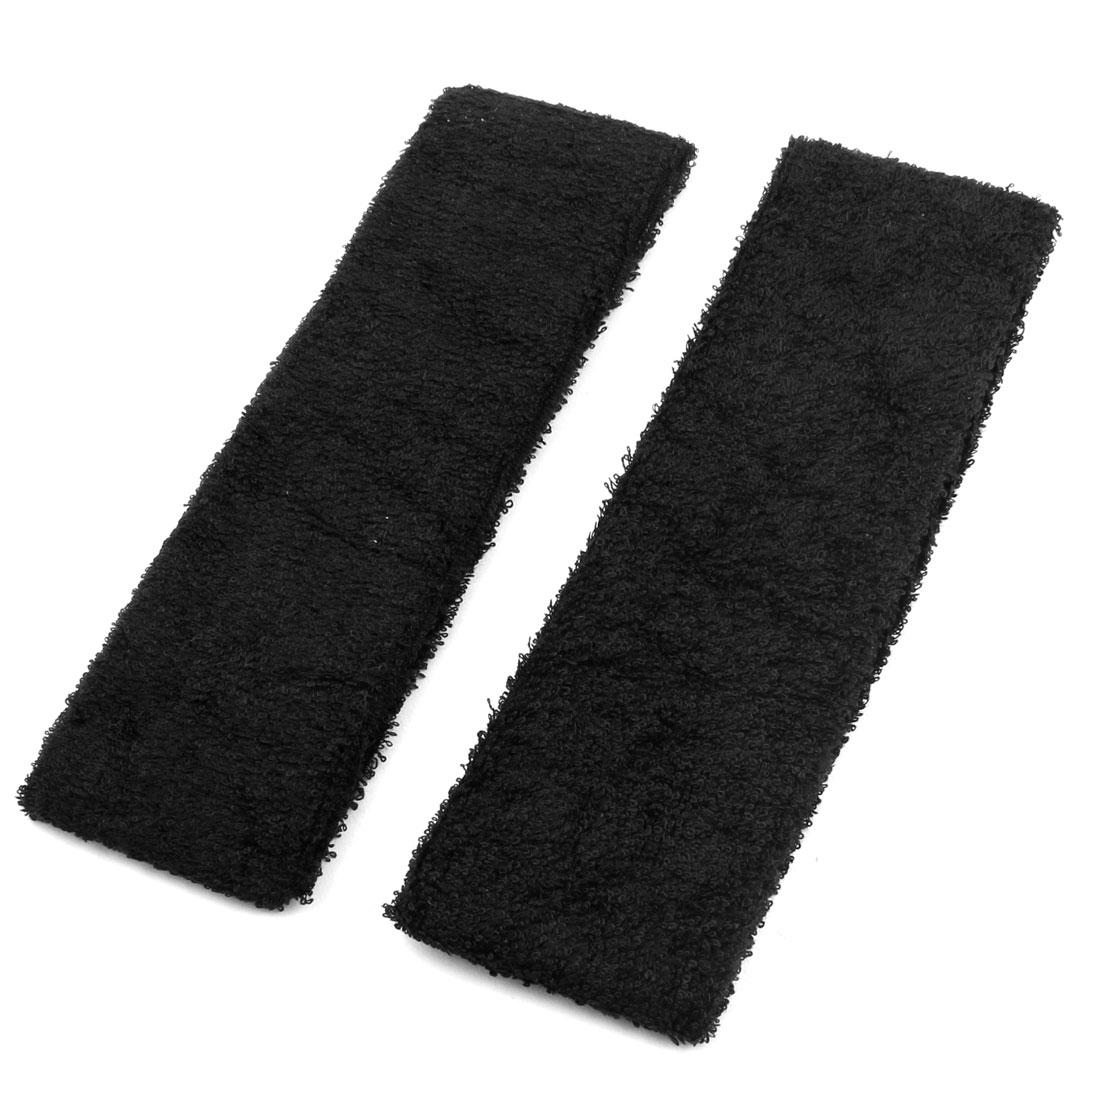 Women Ladies Gym Sports Stretchy Hairband Headband Hair Head Band Black 2pcs